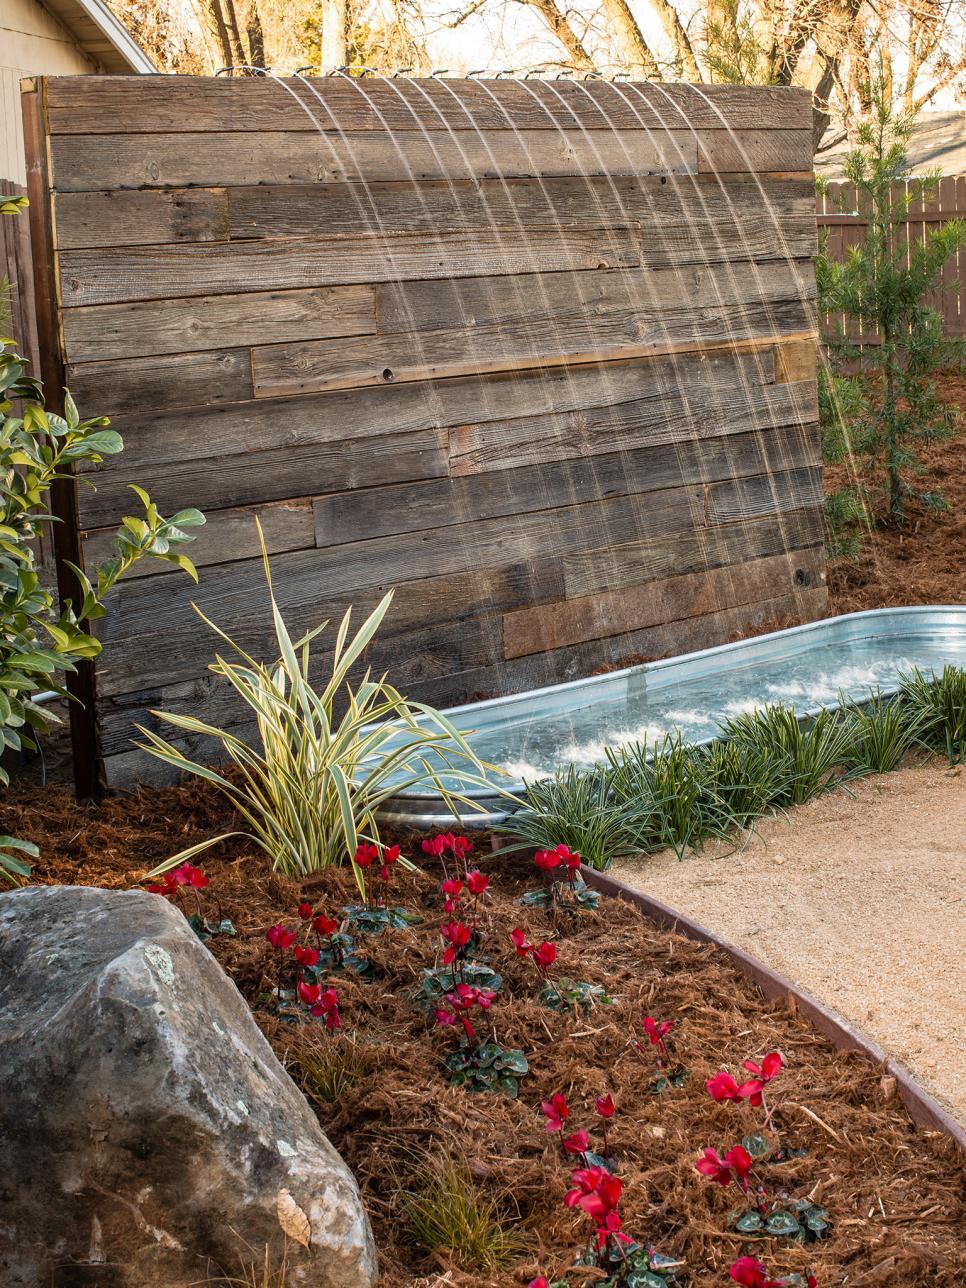 DIY Waterfalls, DIY Waterfall Projects, DIY Waterfall, DIY Water Feature, Garden Ideas, Outdoor DIY